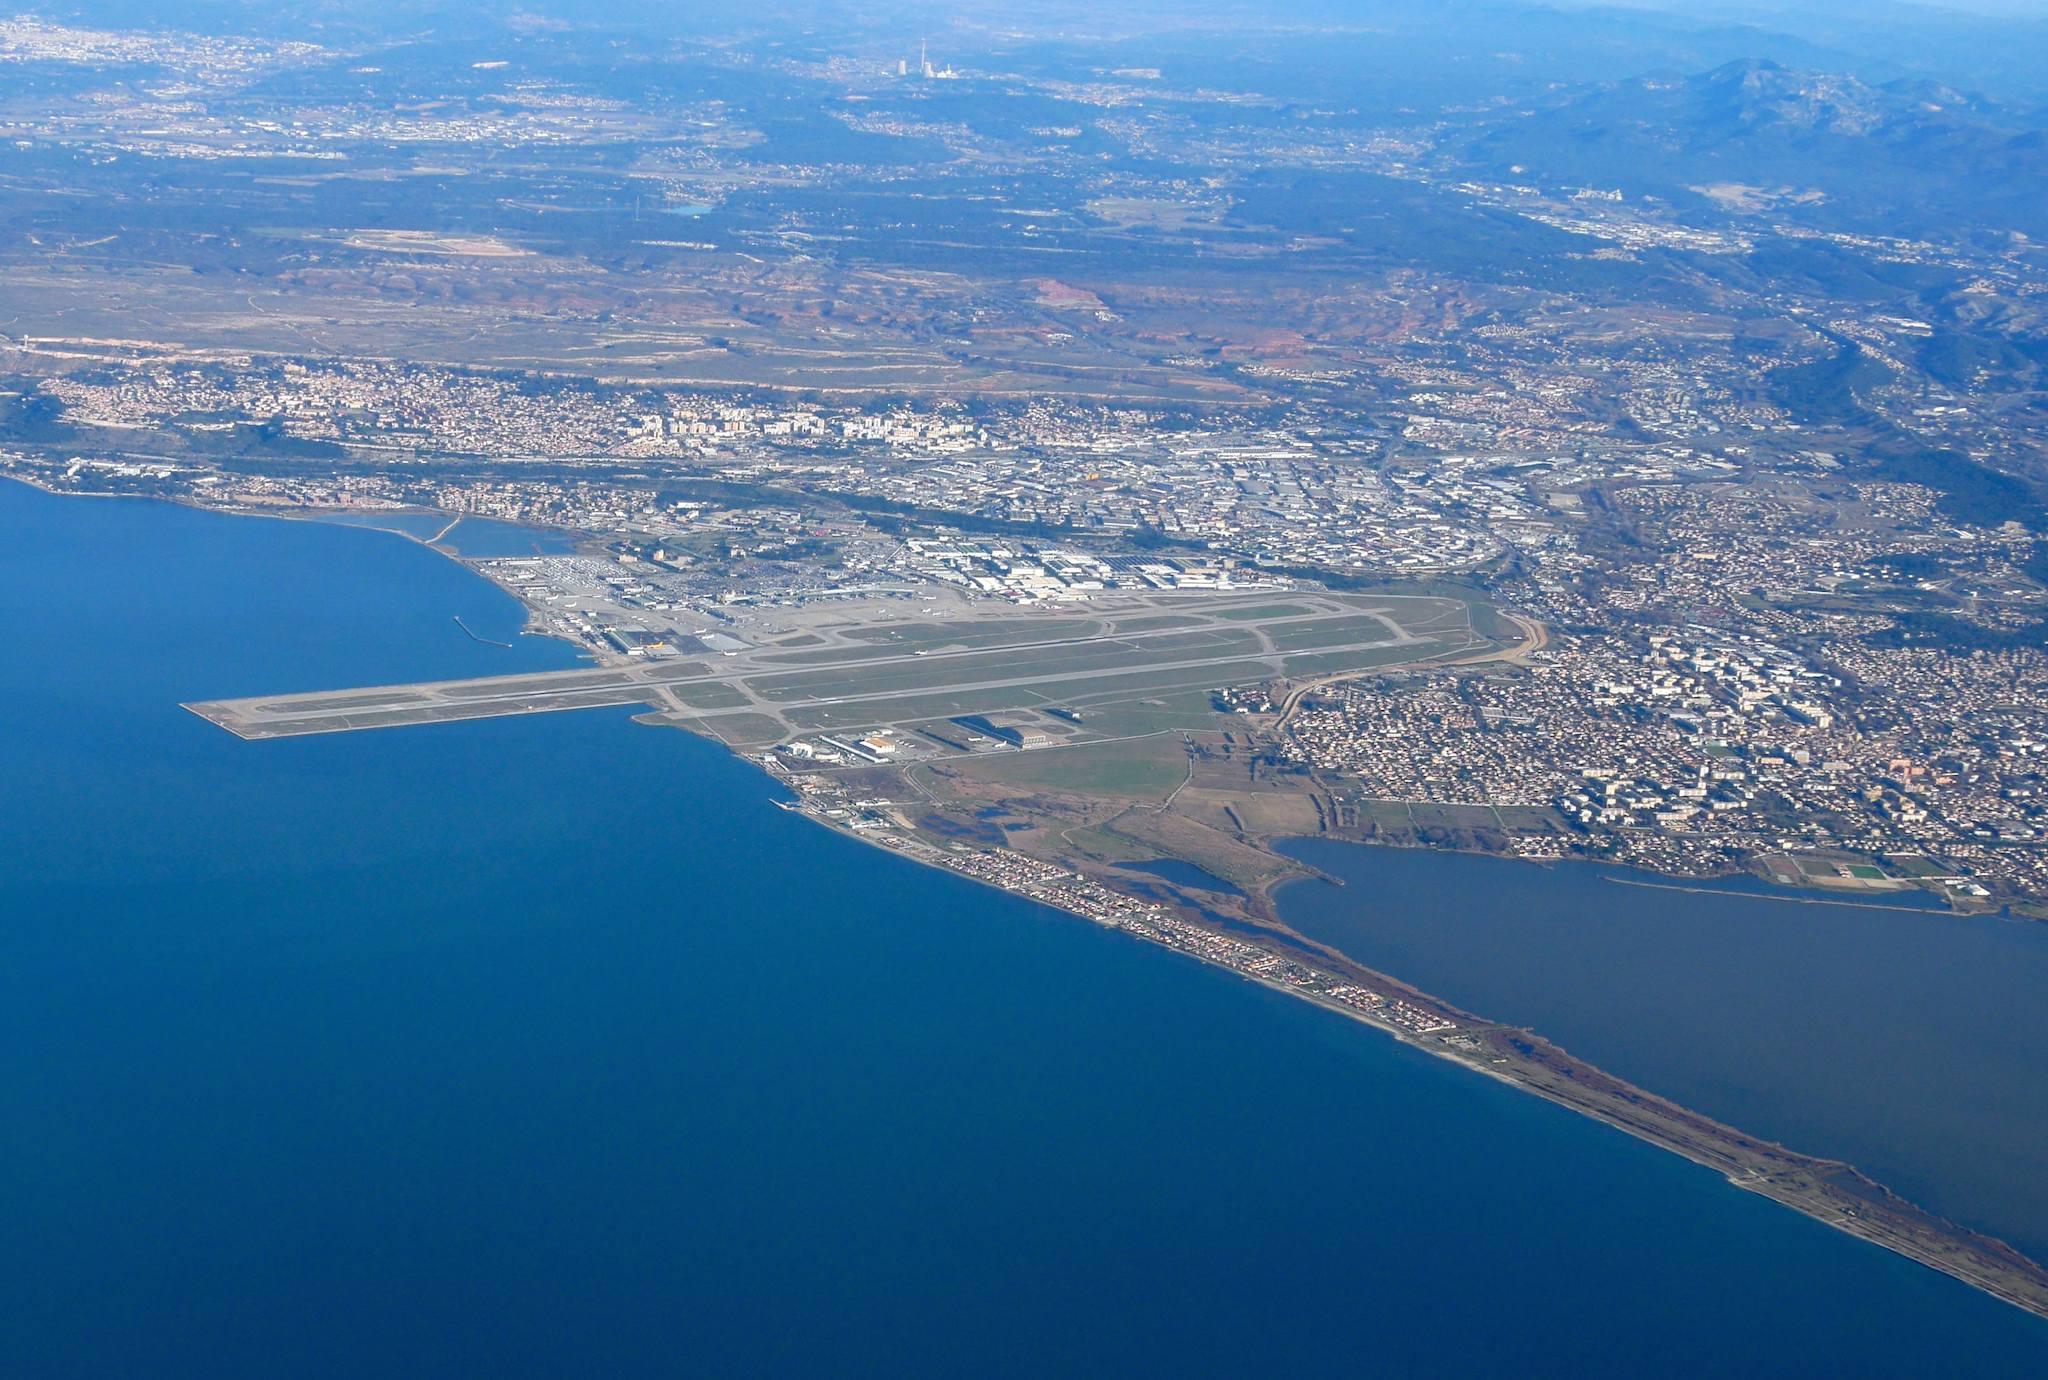 Aéroport Marseille Provence